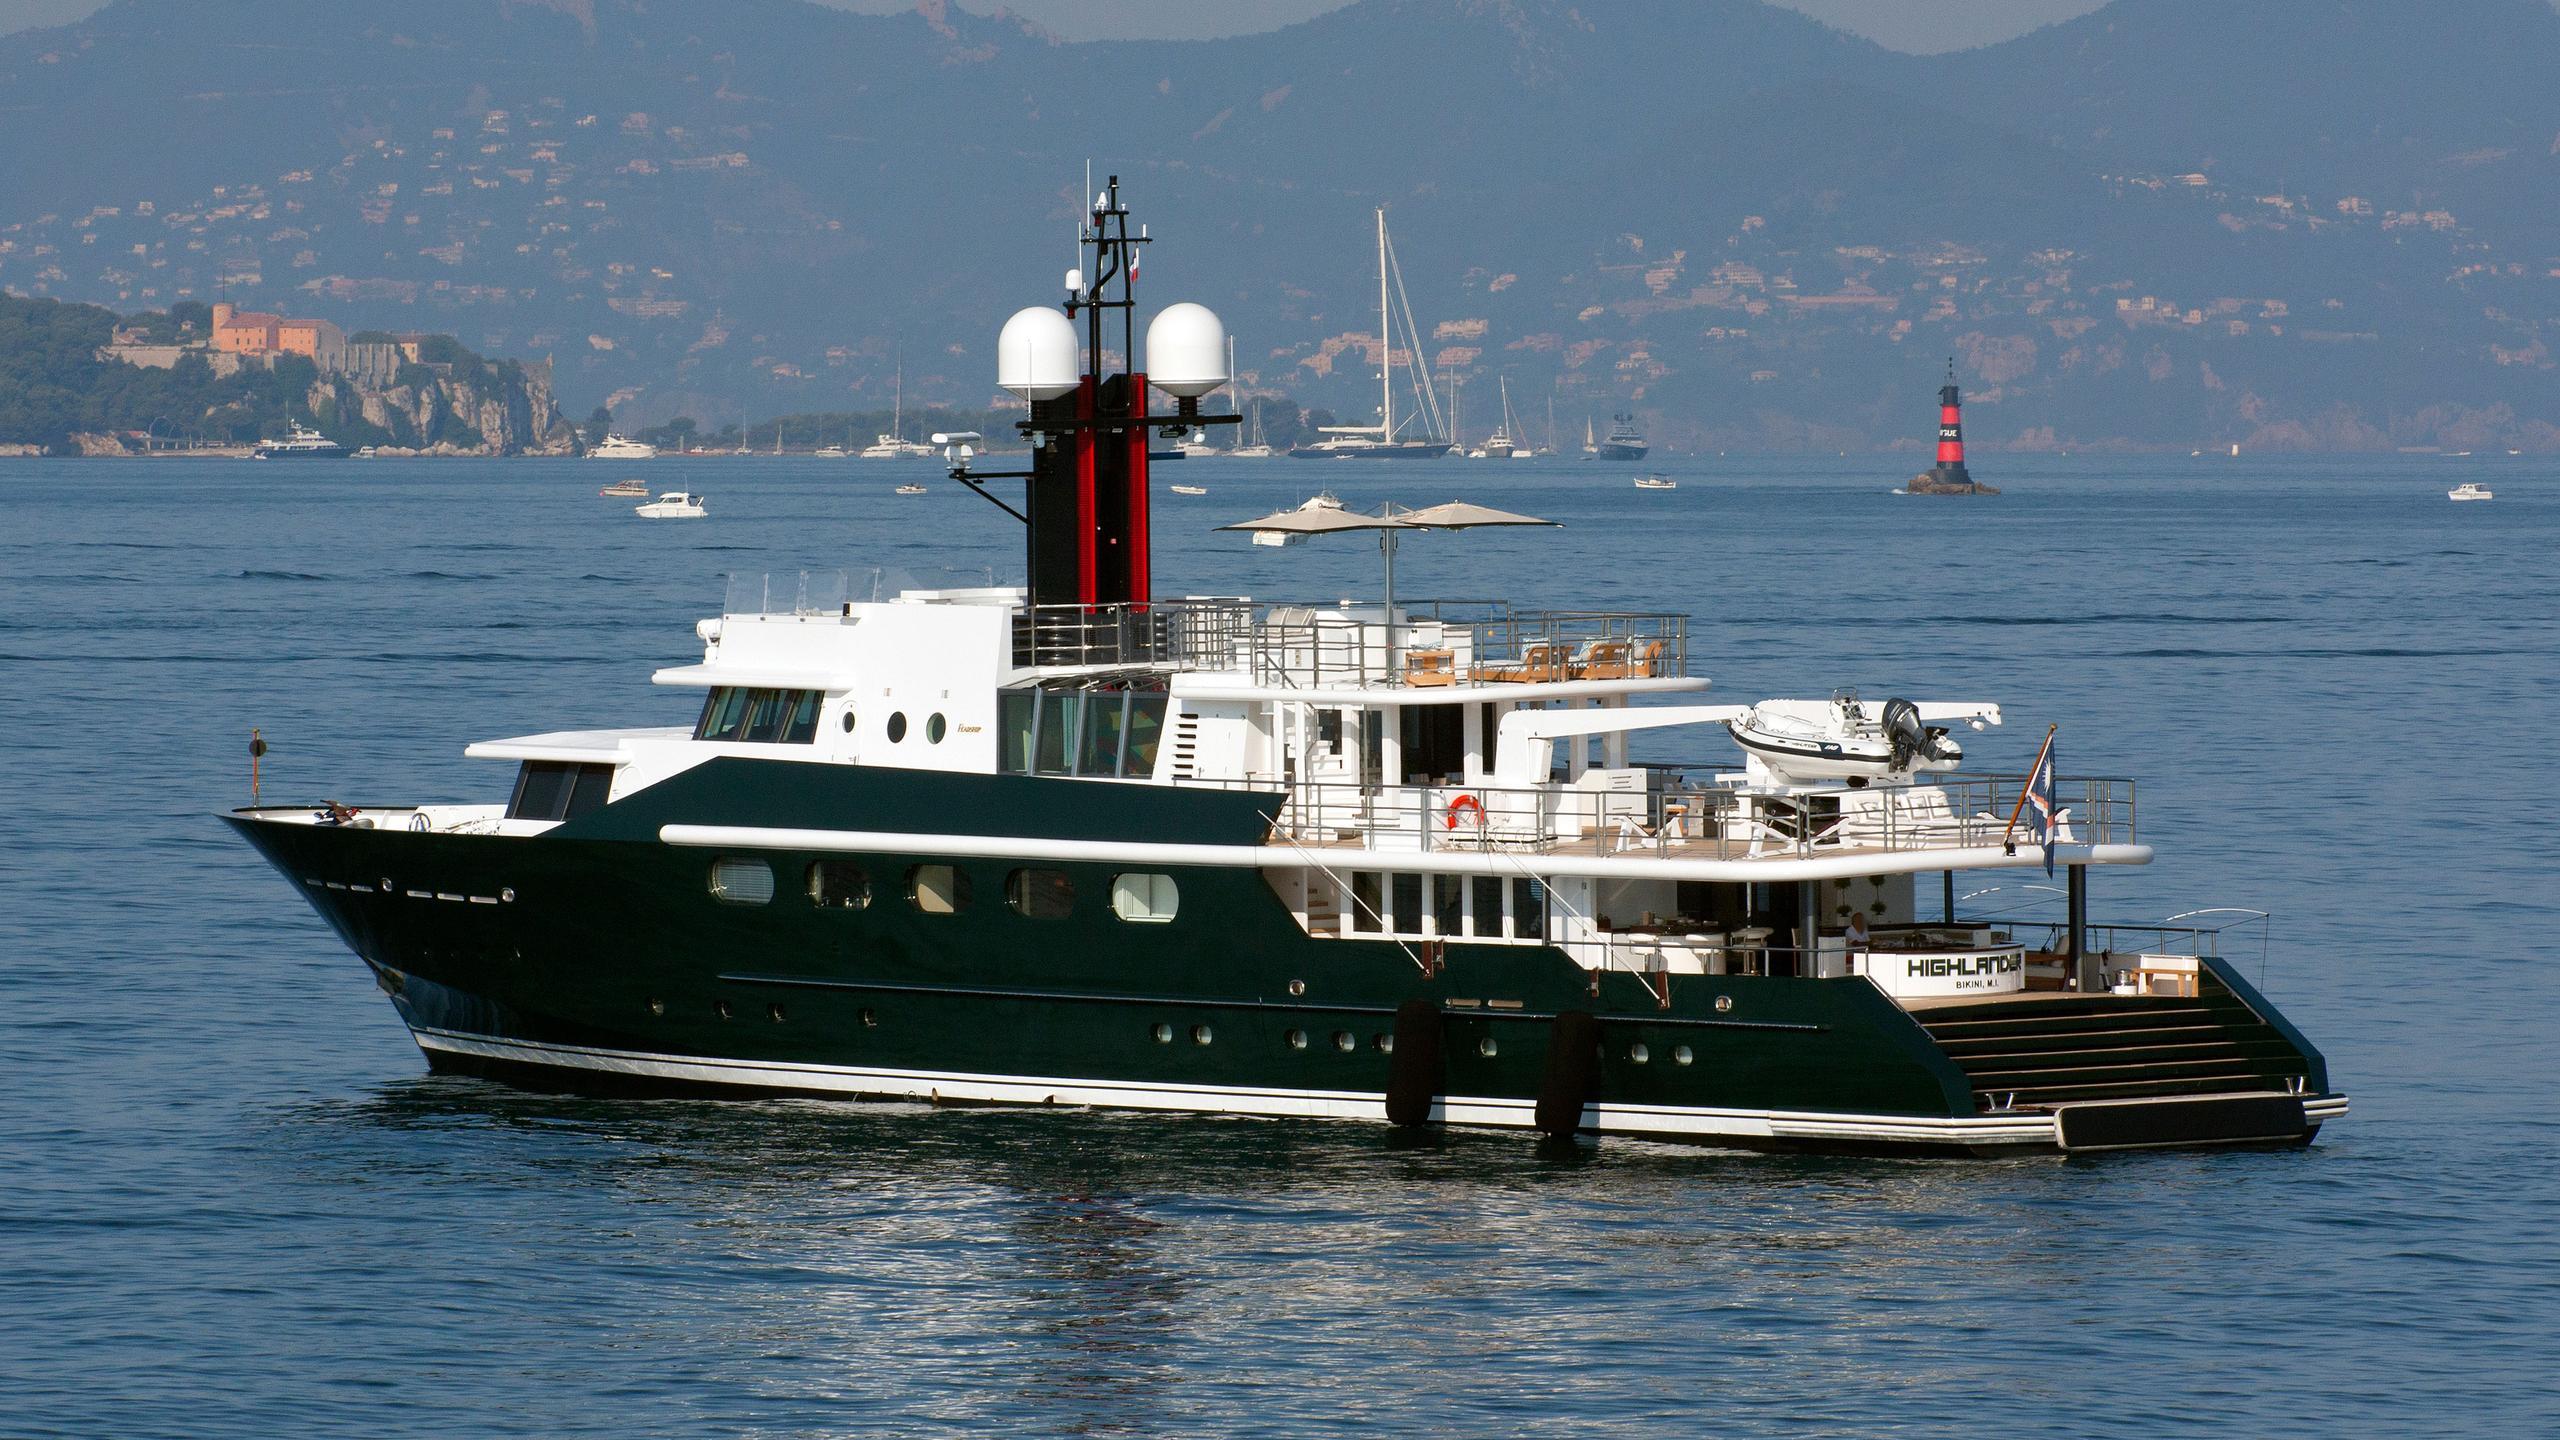 highlander-motor-yacht-feadship-1986-50m-half-stern